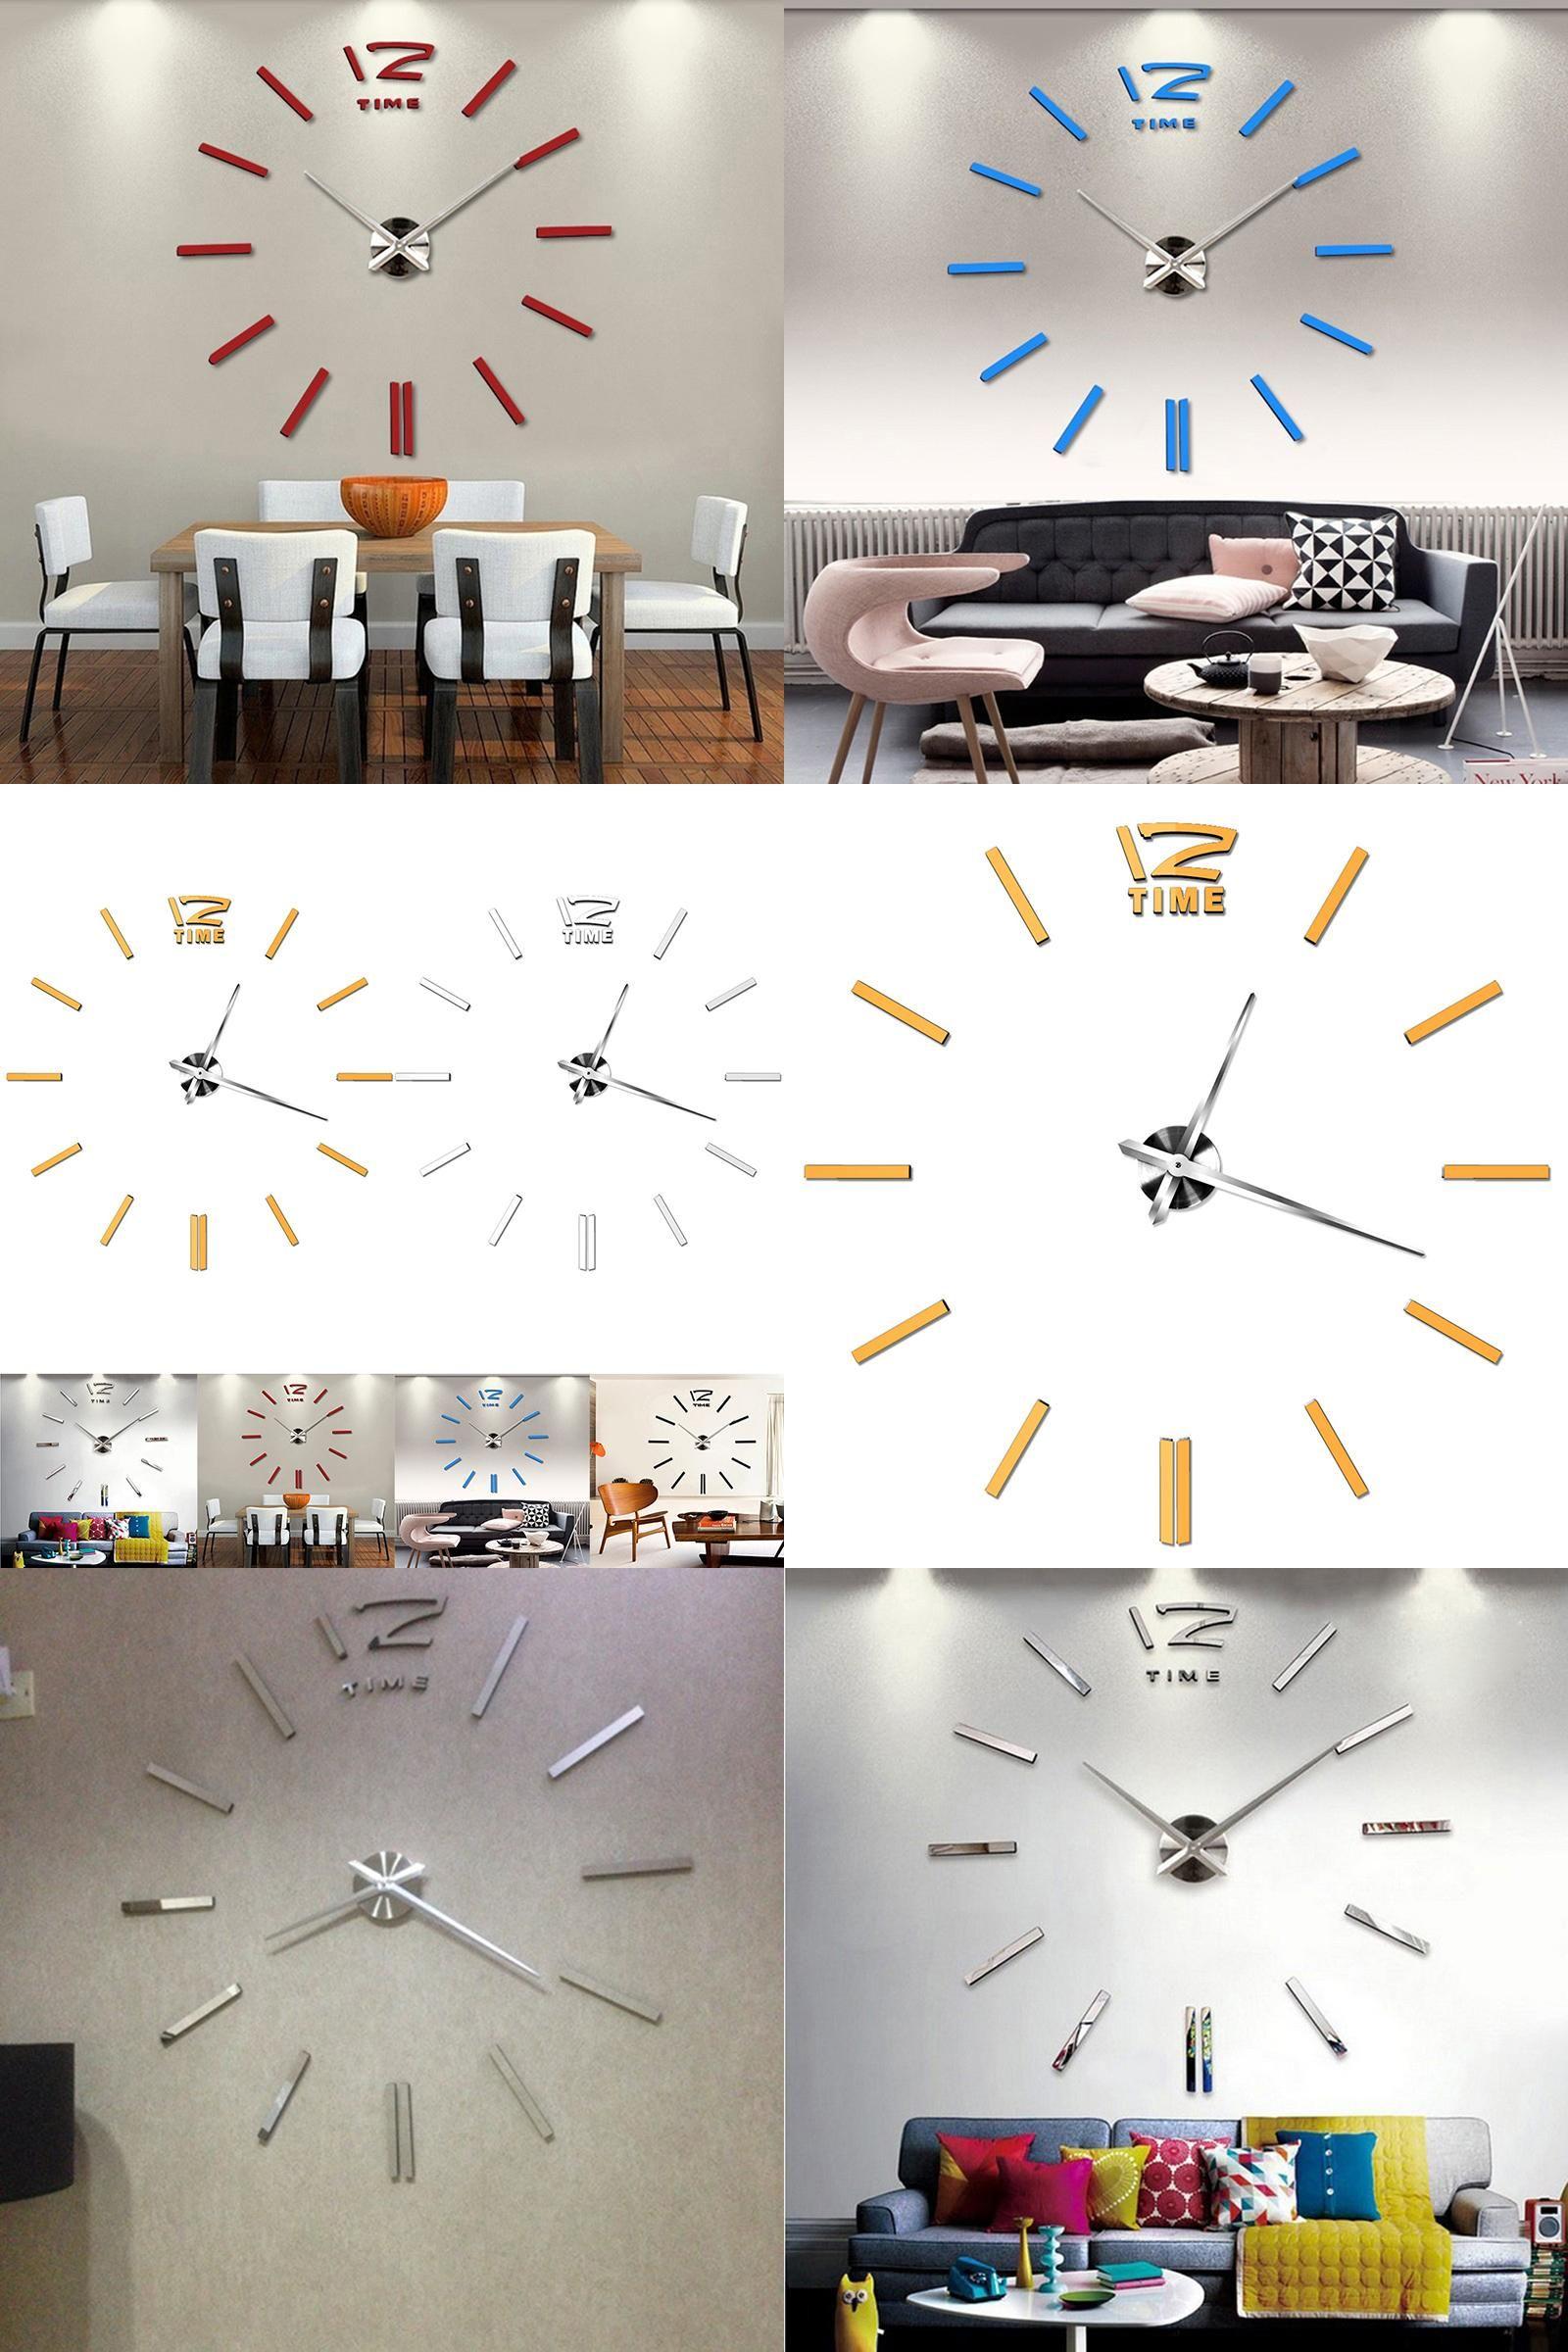 Visit to Buy] 3D Frameless Wall Clock Living Room DIY Home Decor ...